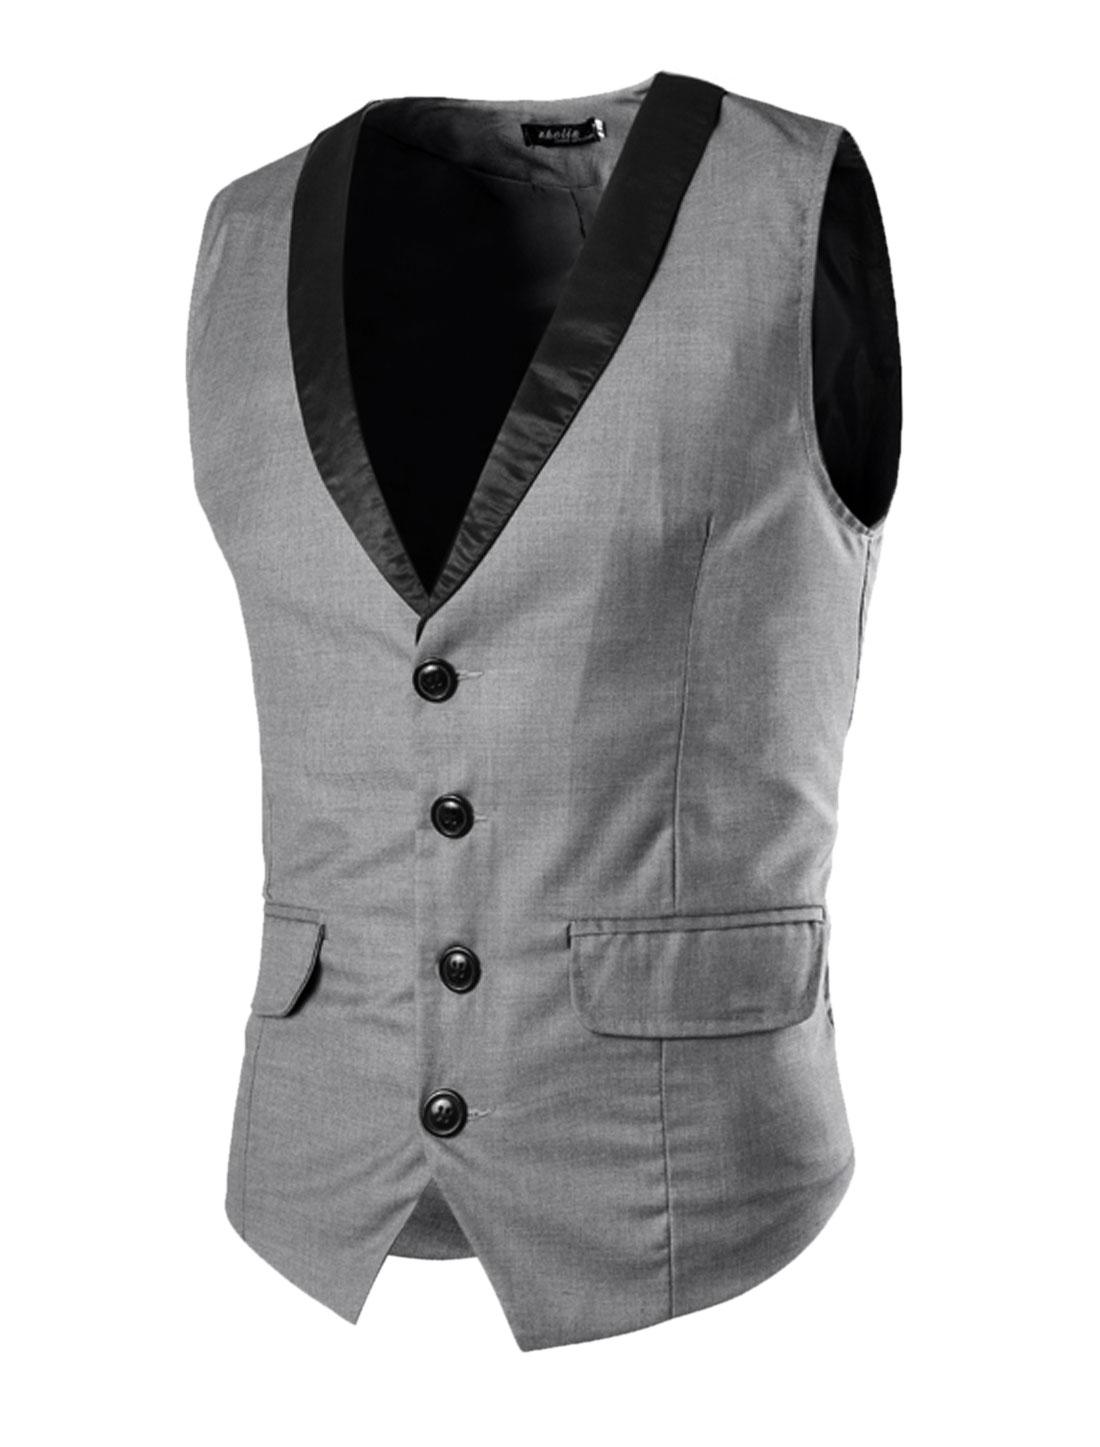 Men Flap Pockets Shawl Lapel Single Breasted Slim Fit Vest Gray S